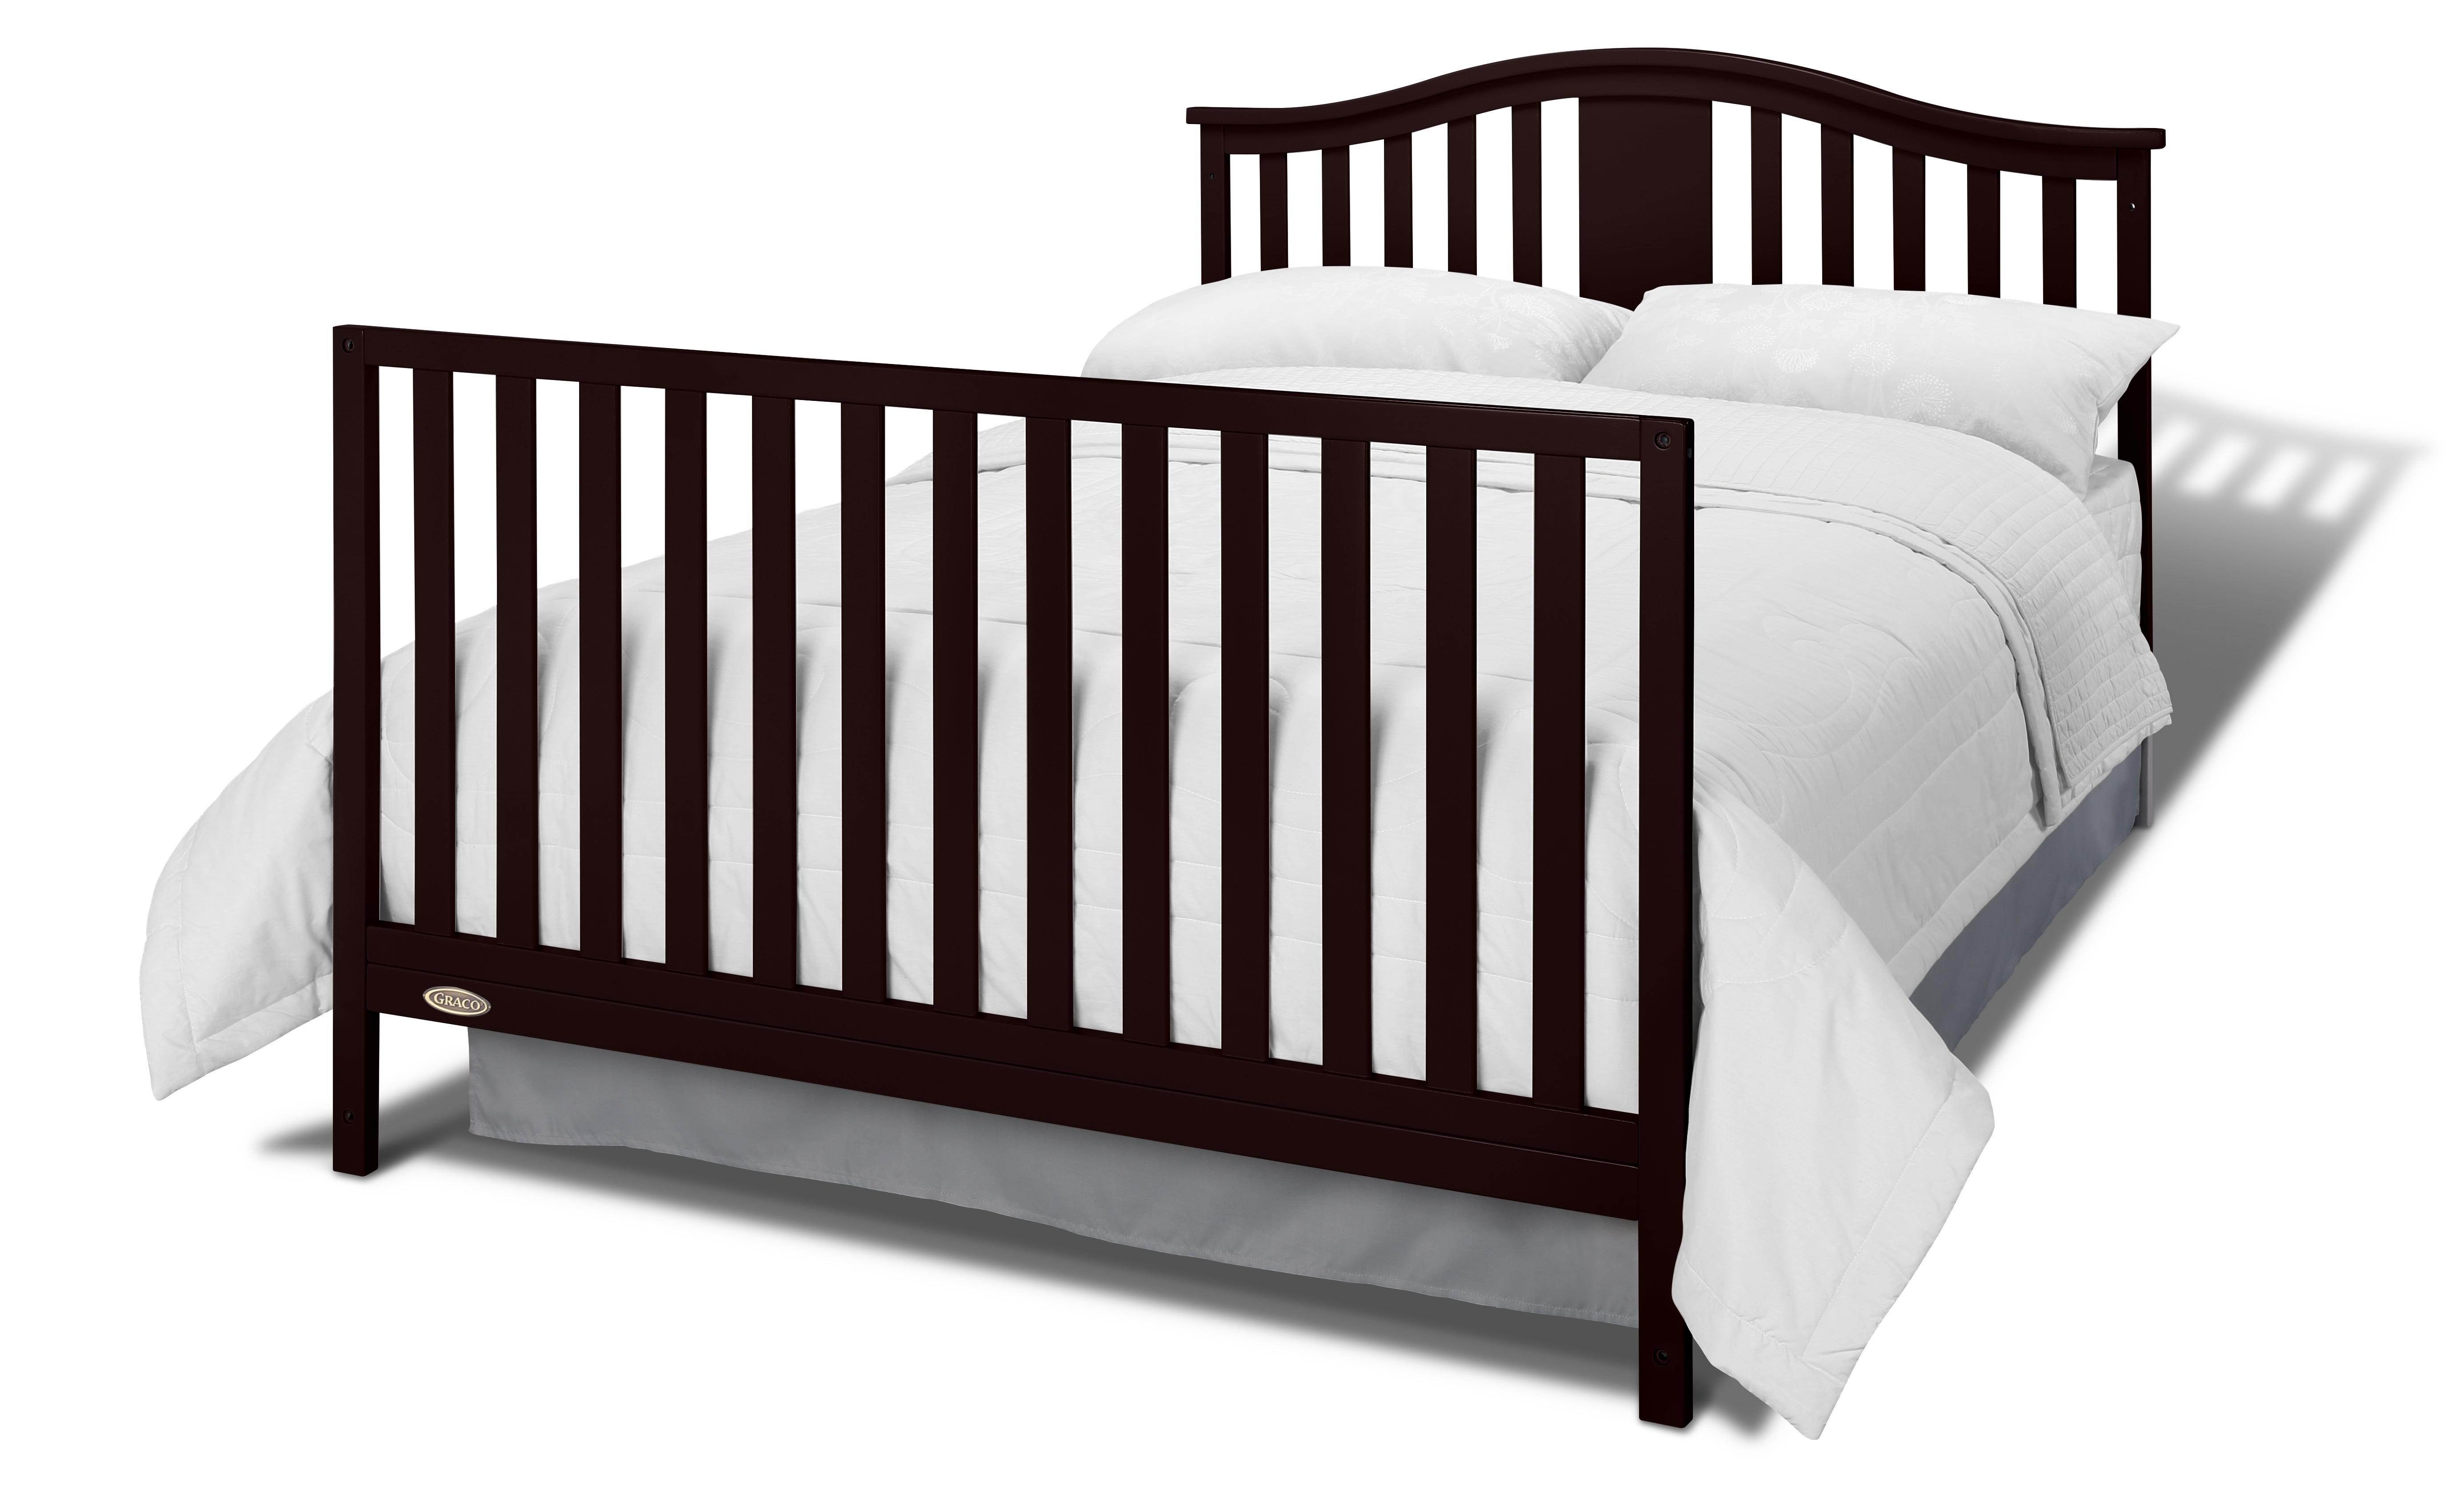 Simplicity Crib Parts Simplicity Crib Parts With